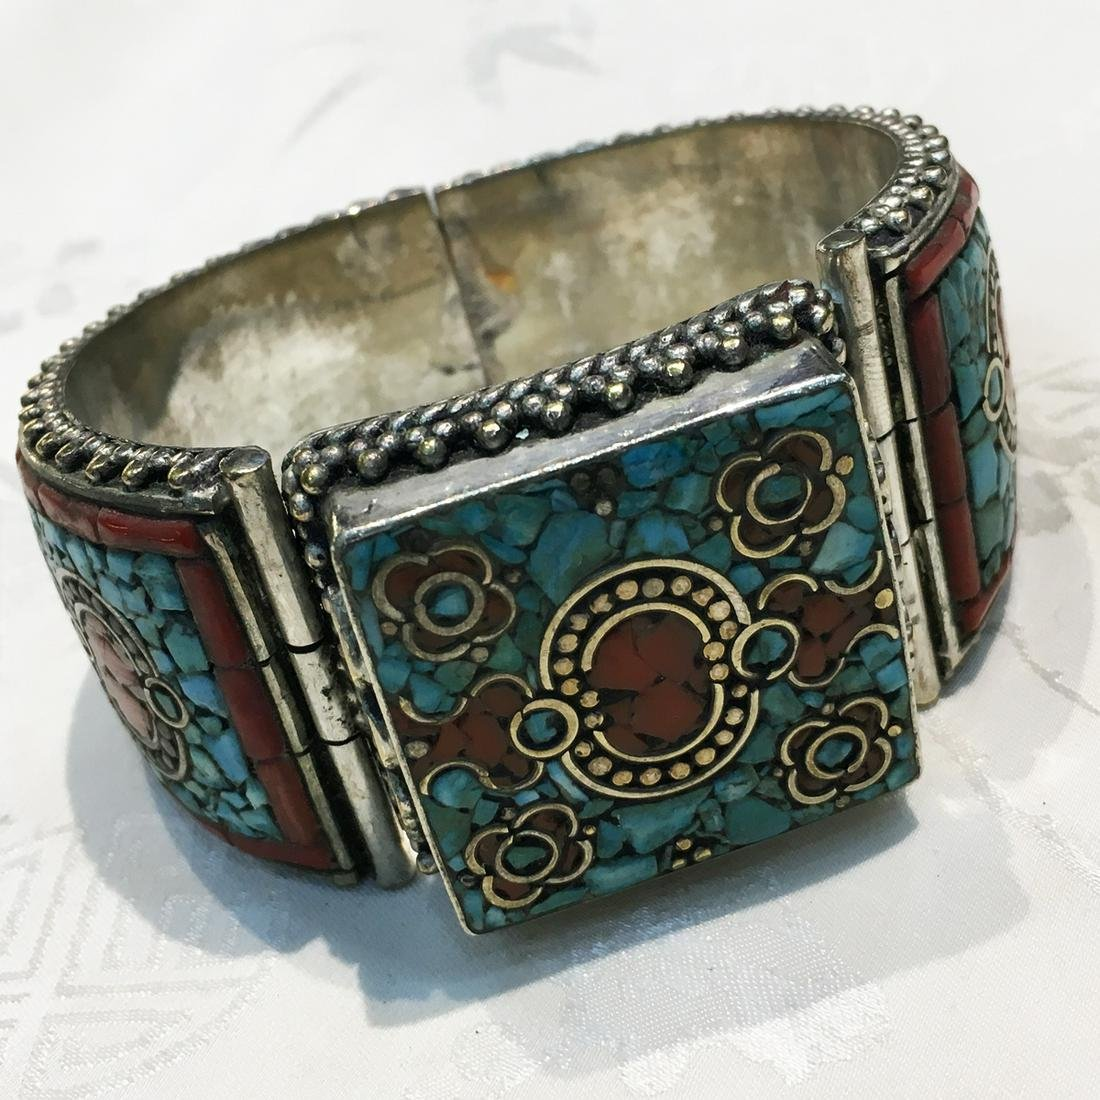 Gypsy Tibetan Designer Turquoise & Coral Bangle